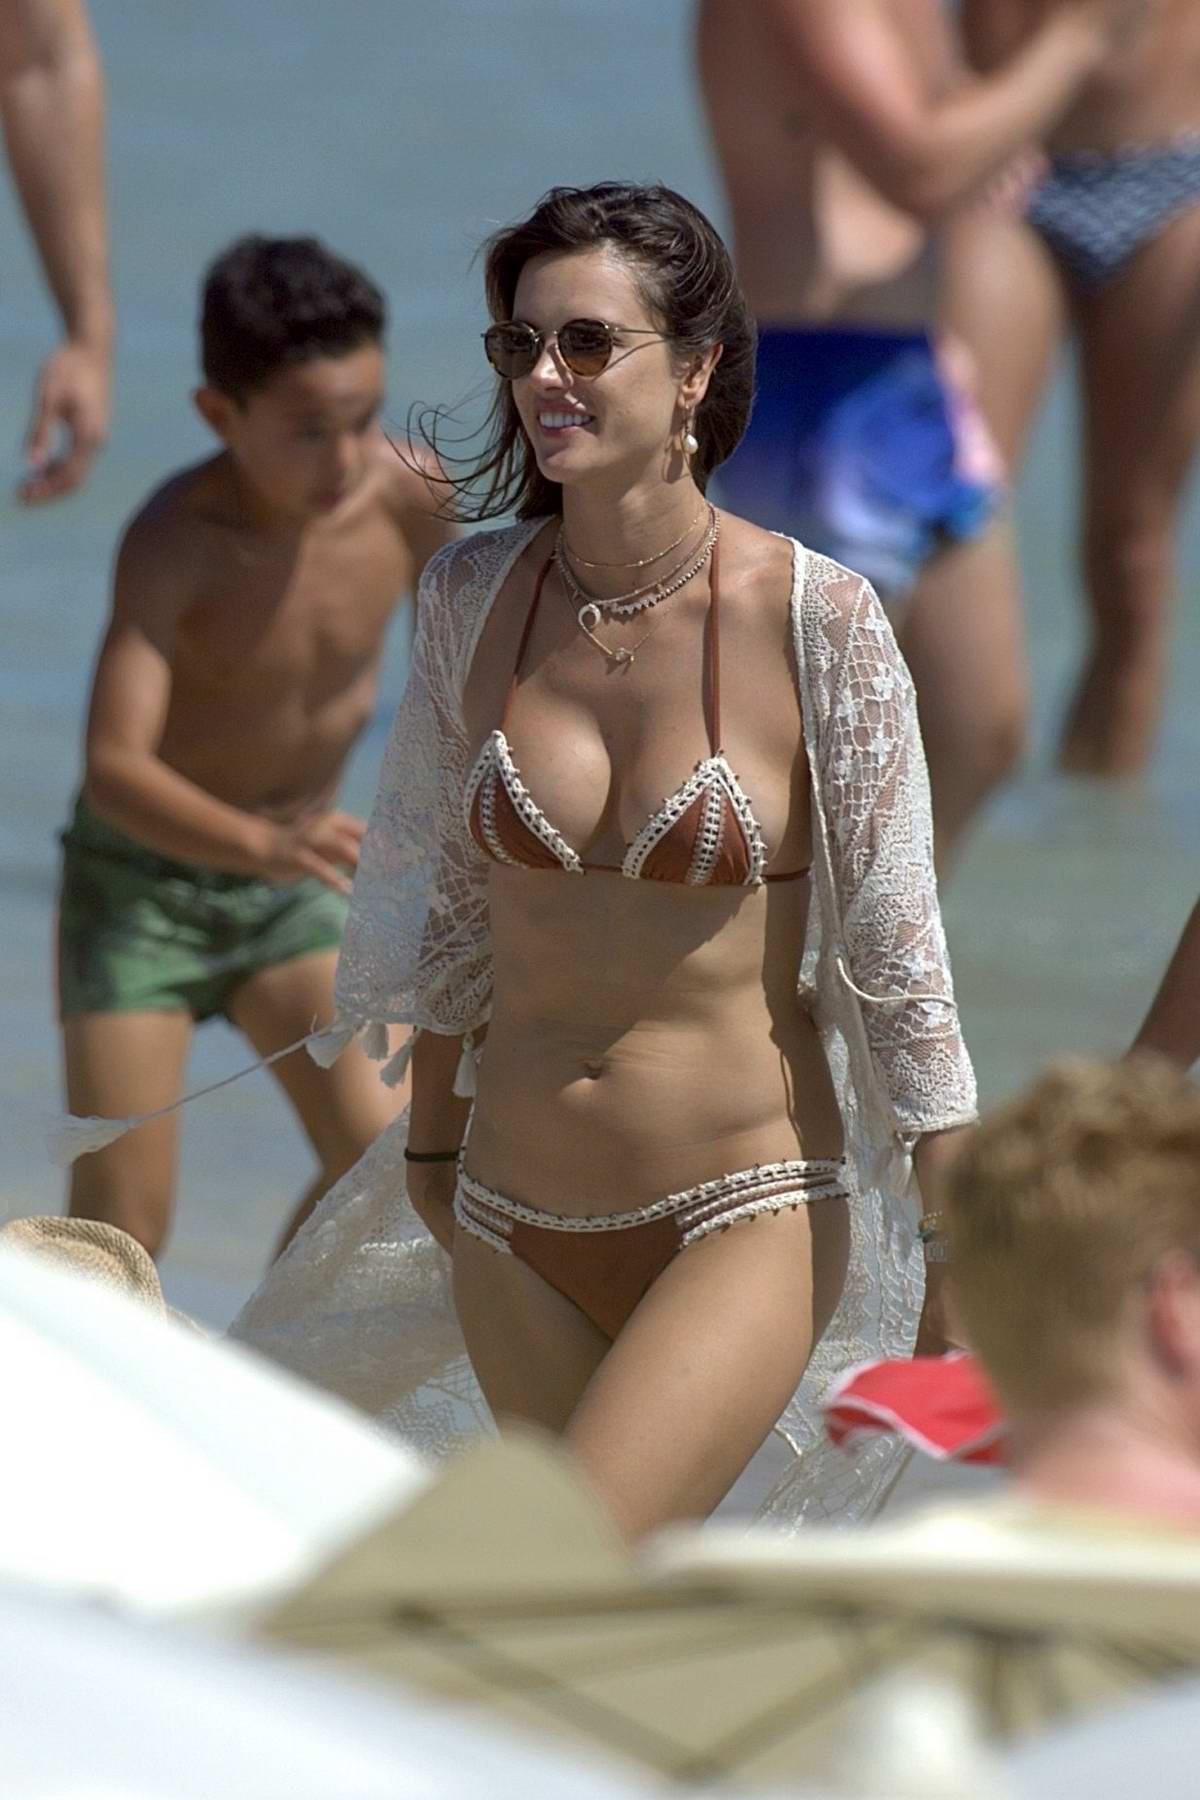 Bikini Alessandra Ambrosio naked (37 foto and video), Sexy, Fappening, Feet, lingerie 2006